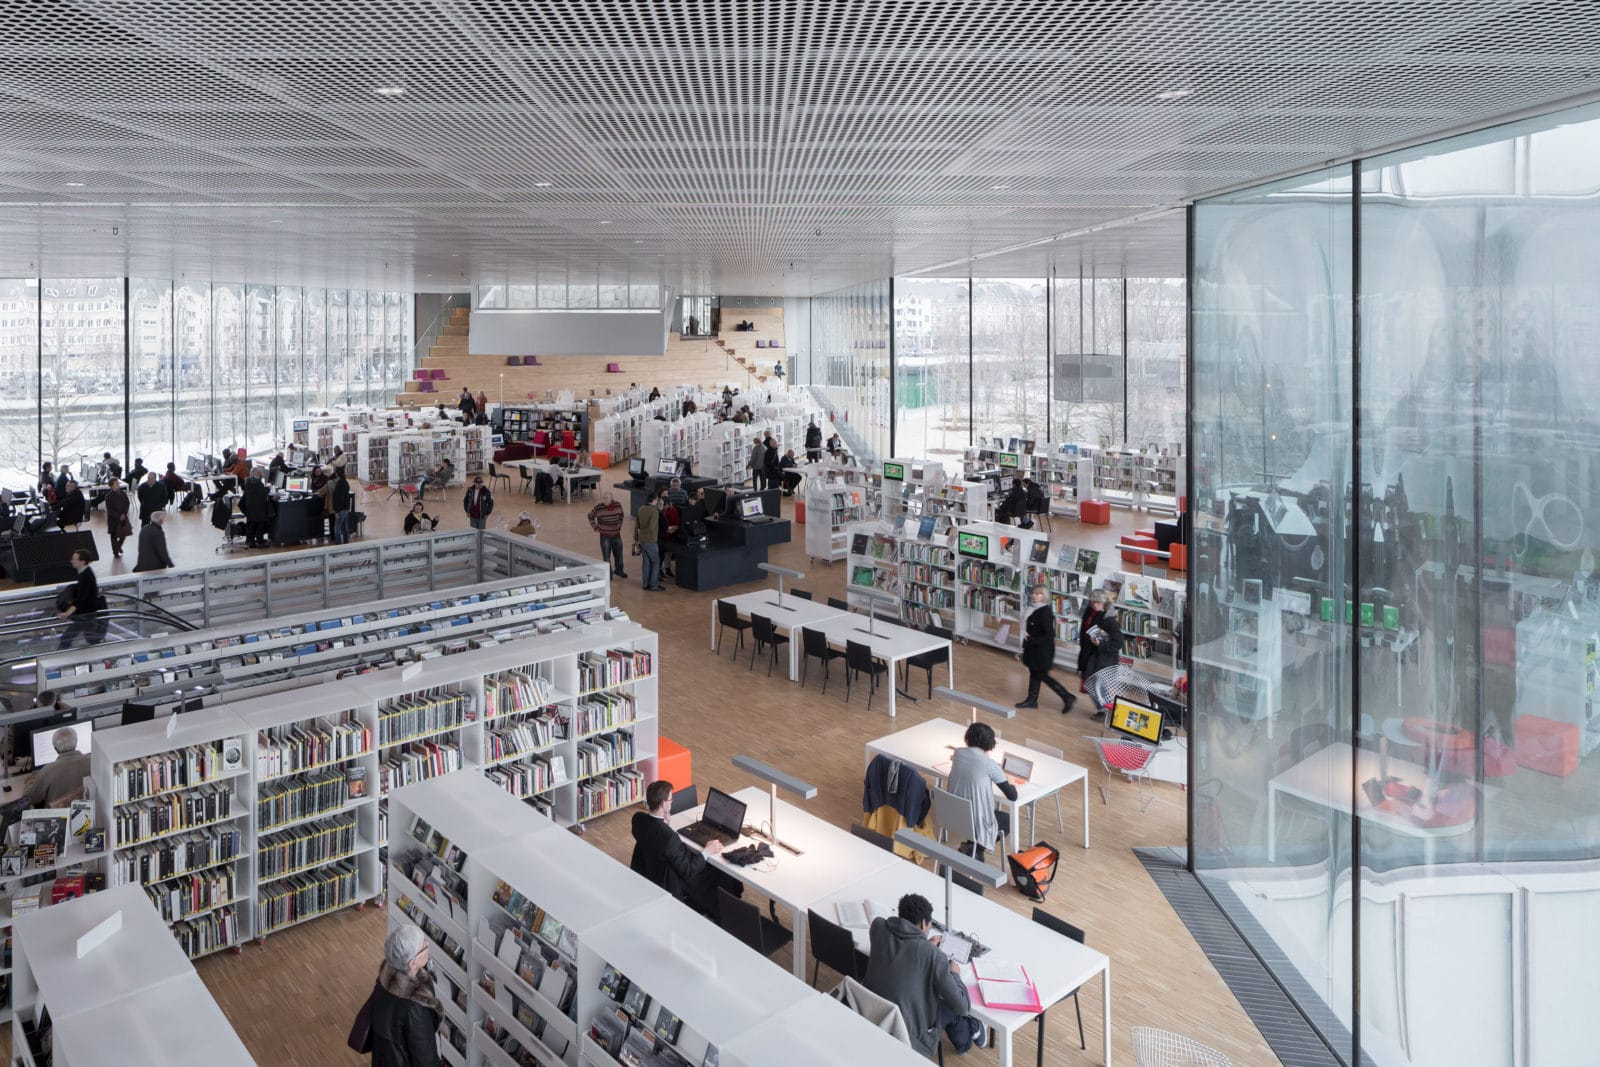 02_Bibliothèque Alexis de Tocqueville_ Photo by Iwan Baan_6702